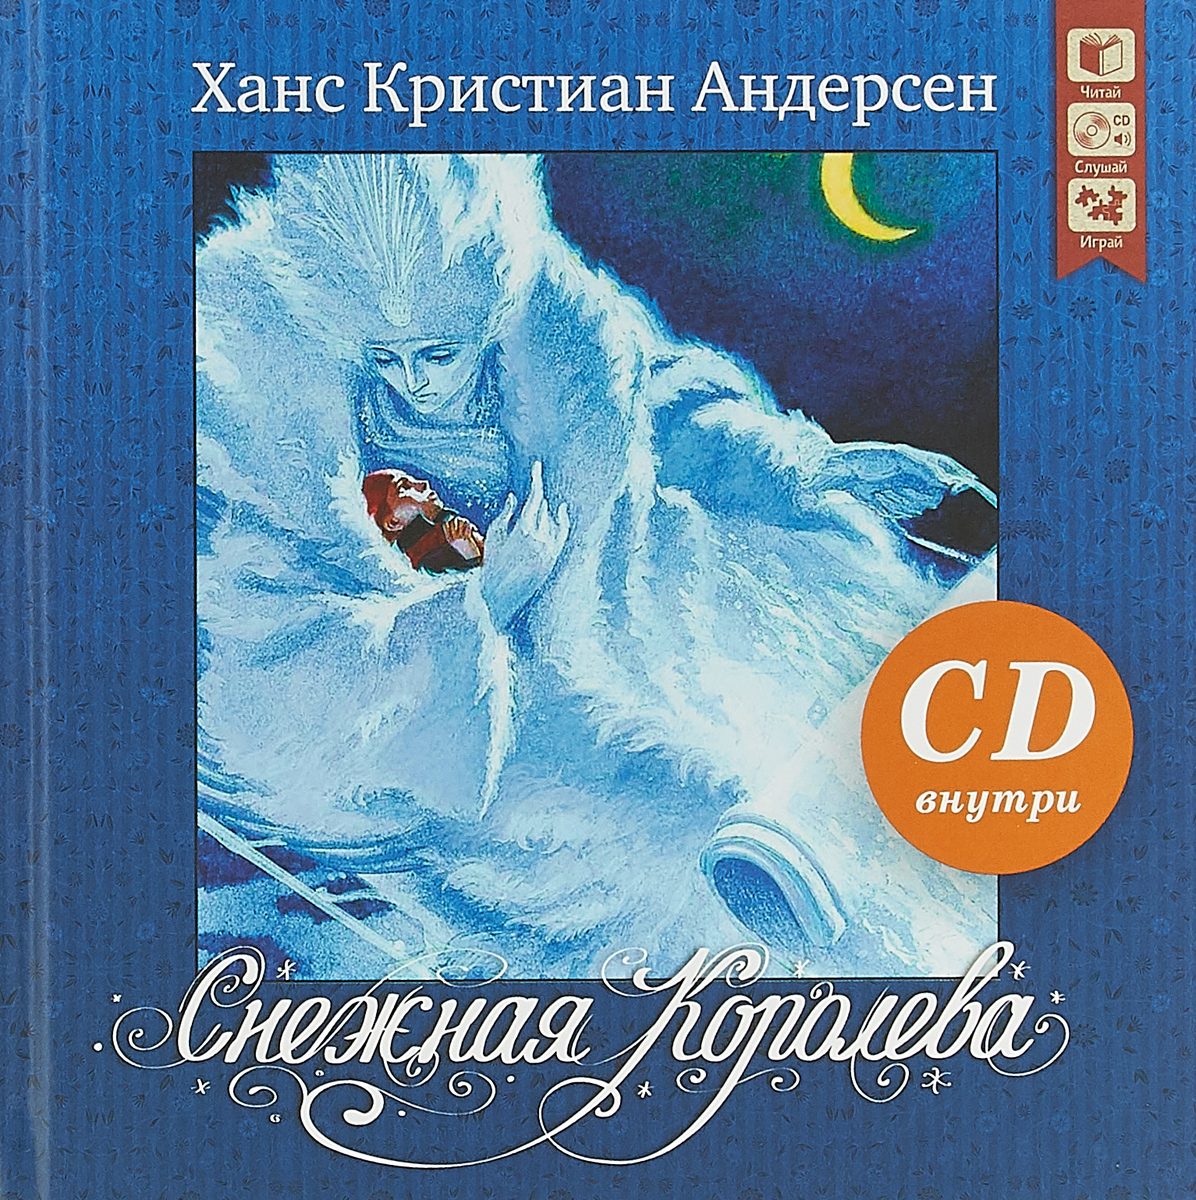 Ханс Кристиан Андерсен Снежная королева (+ CD)